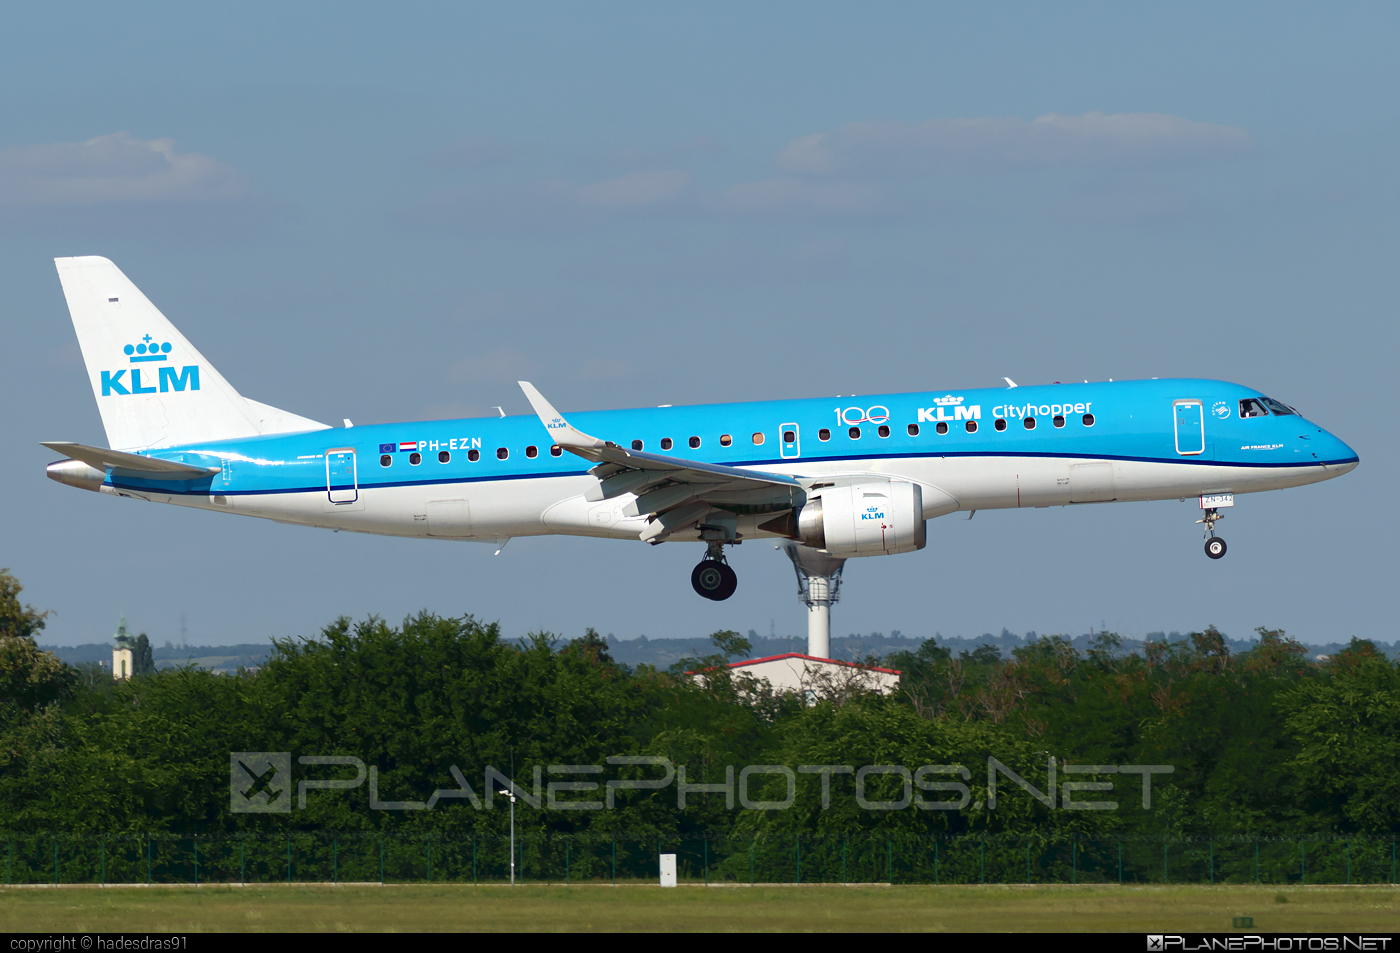 Embraer E190STD (ERJ-190-100STD) - PH-EZN operated by KLM Cityhopper #e190 #e190100 #e190100std #e190std #embraer #embraer190 #embraer190100std #embraer190std #klm #klmcityhopper